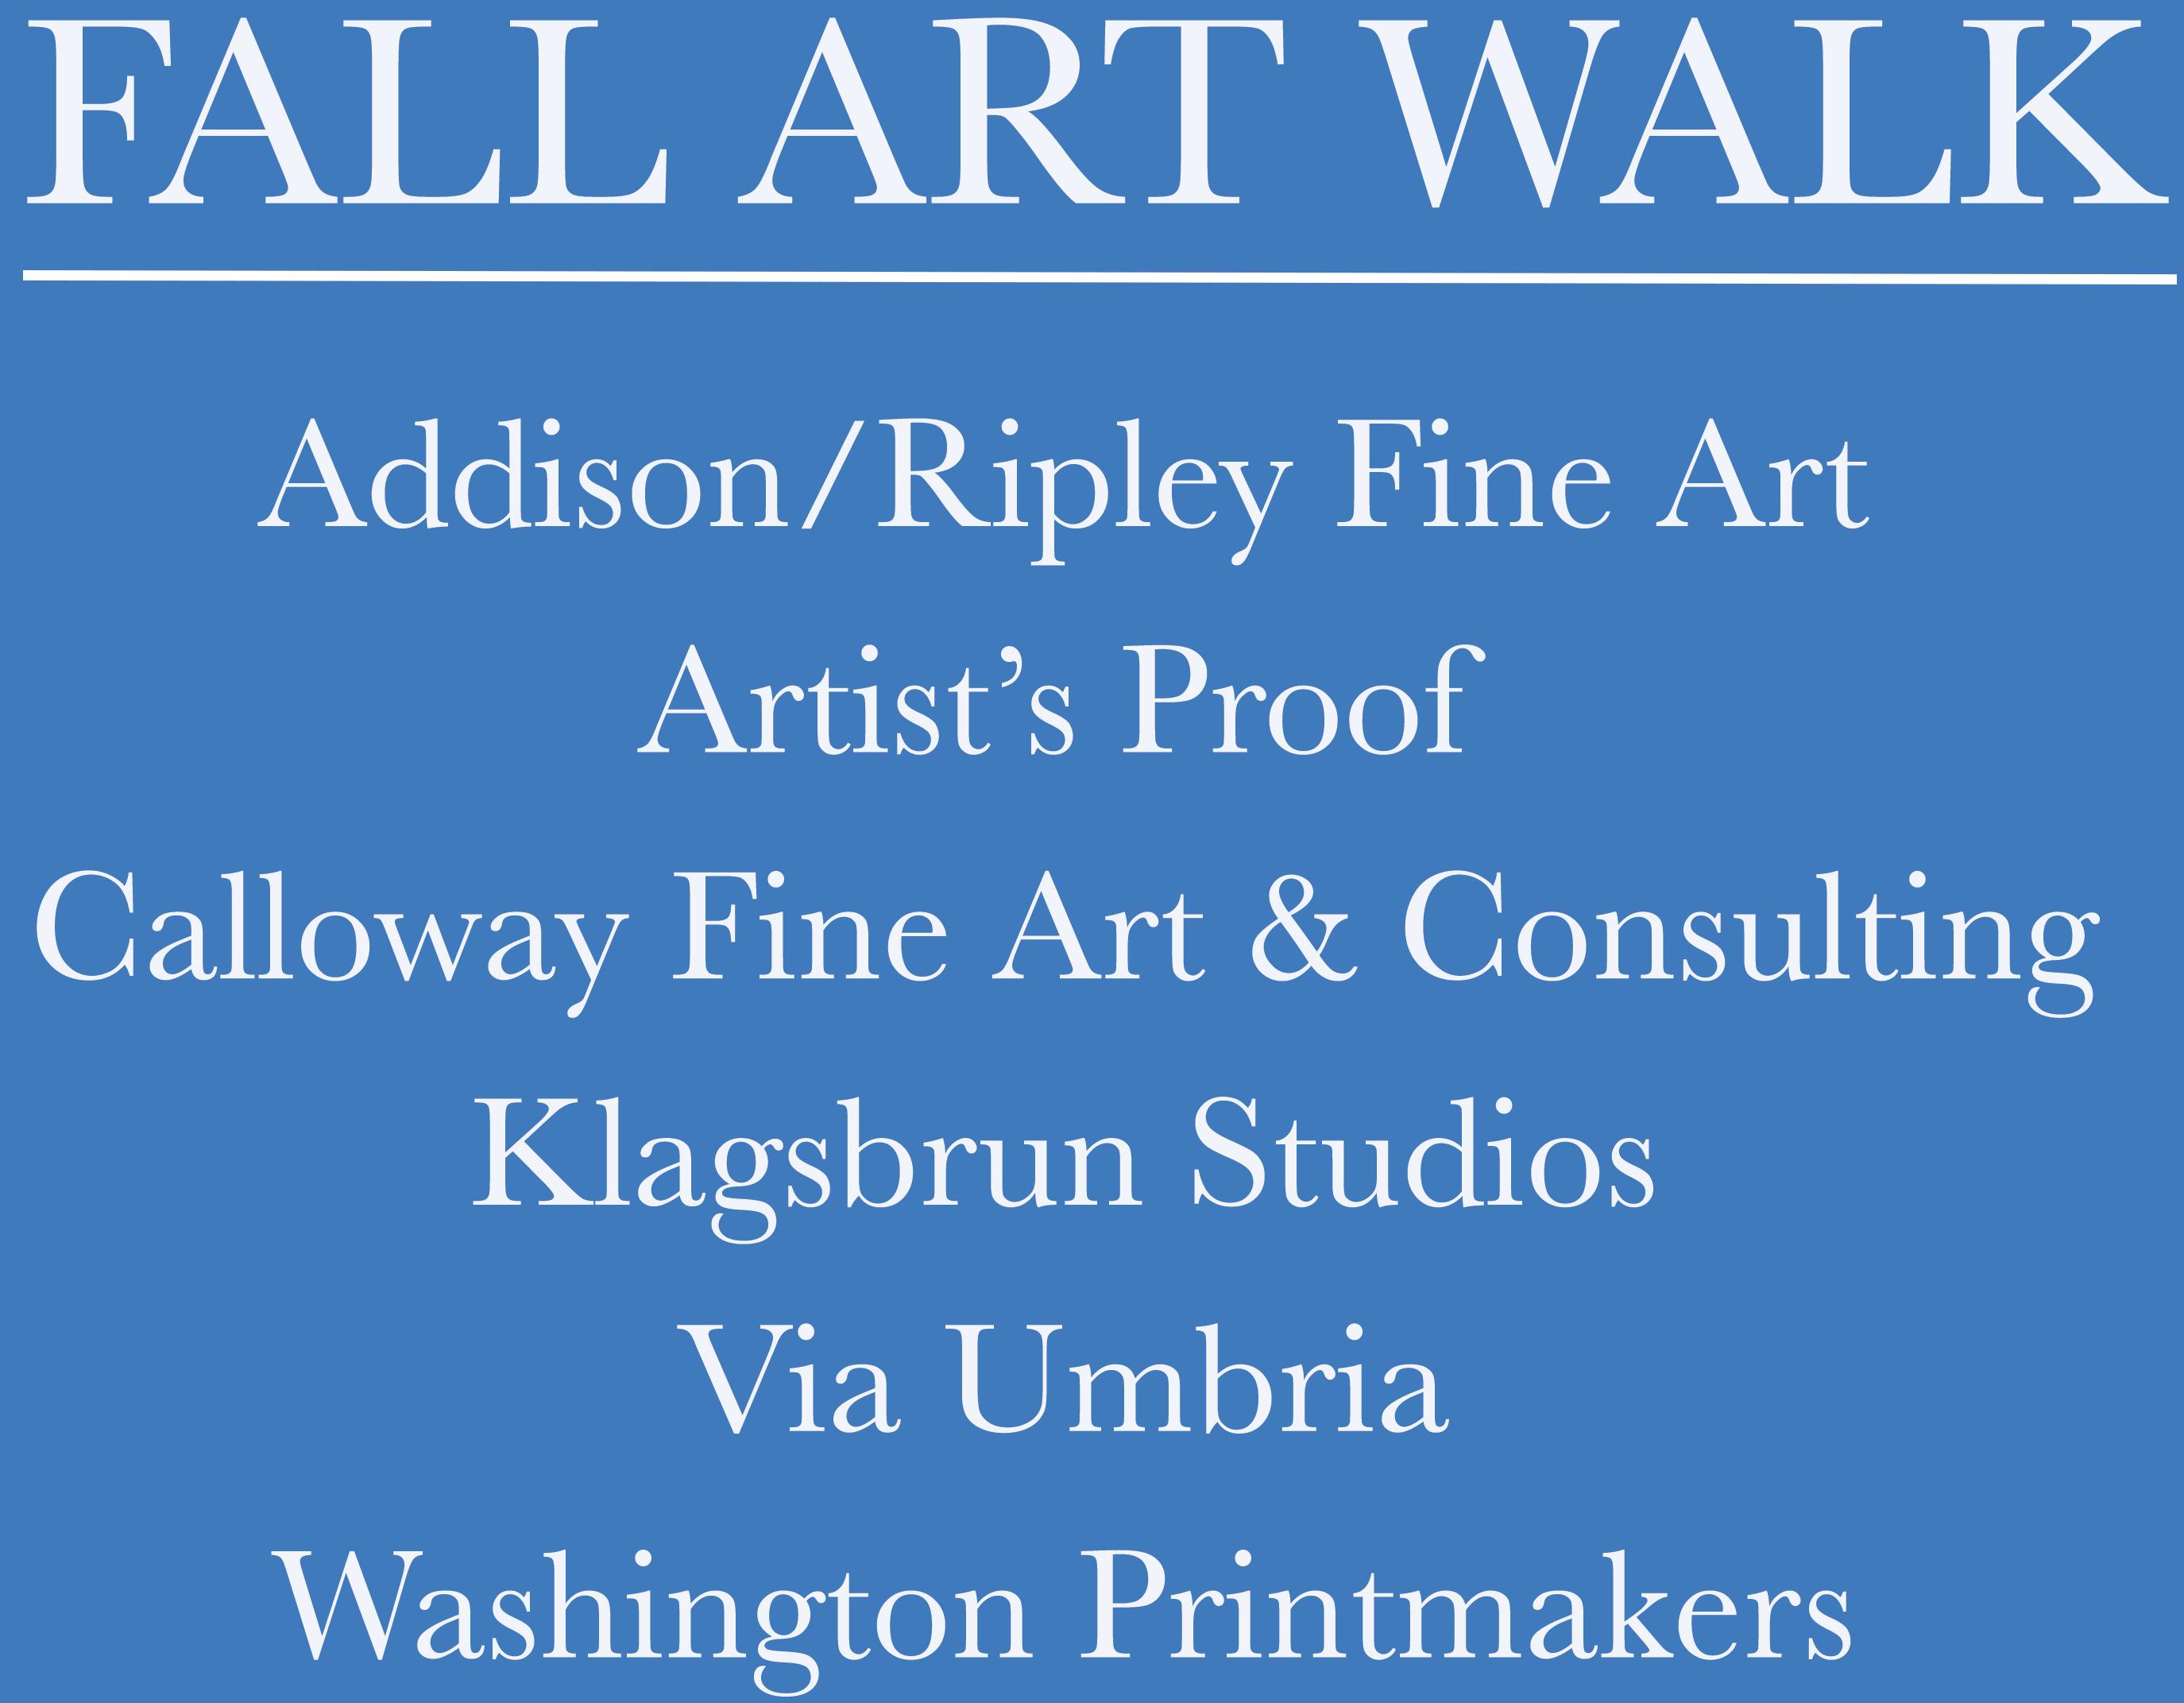 GEORGETOWN GALLERIES FALL ART WALK